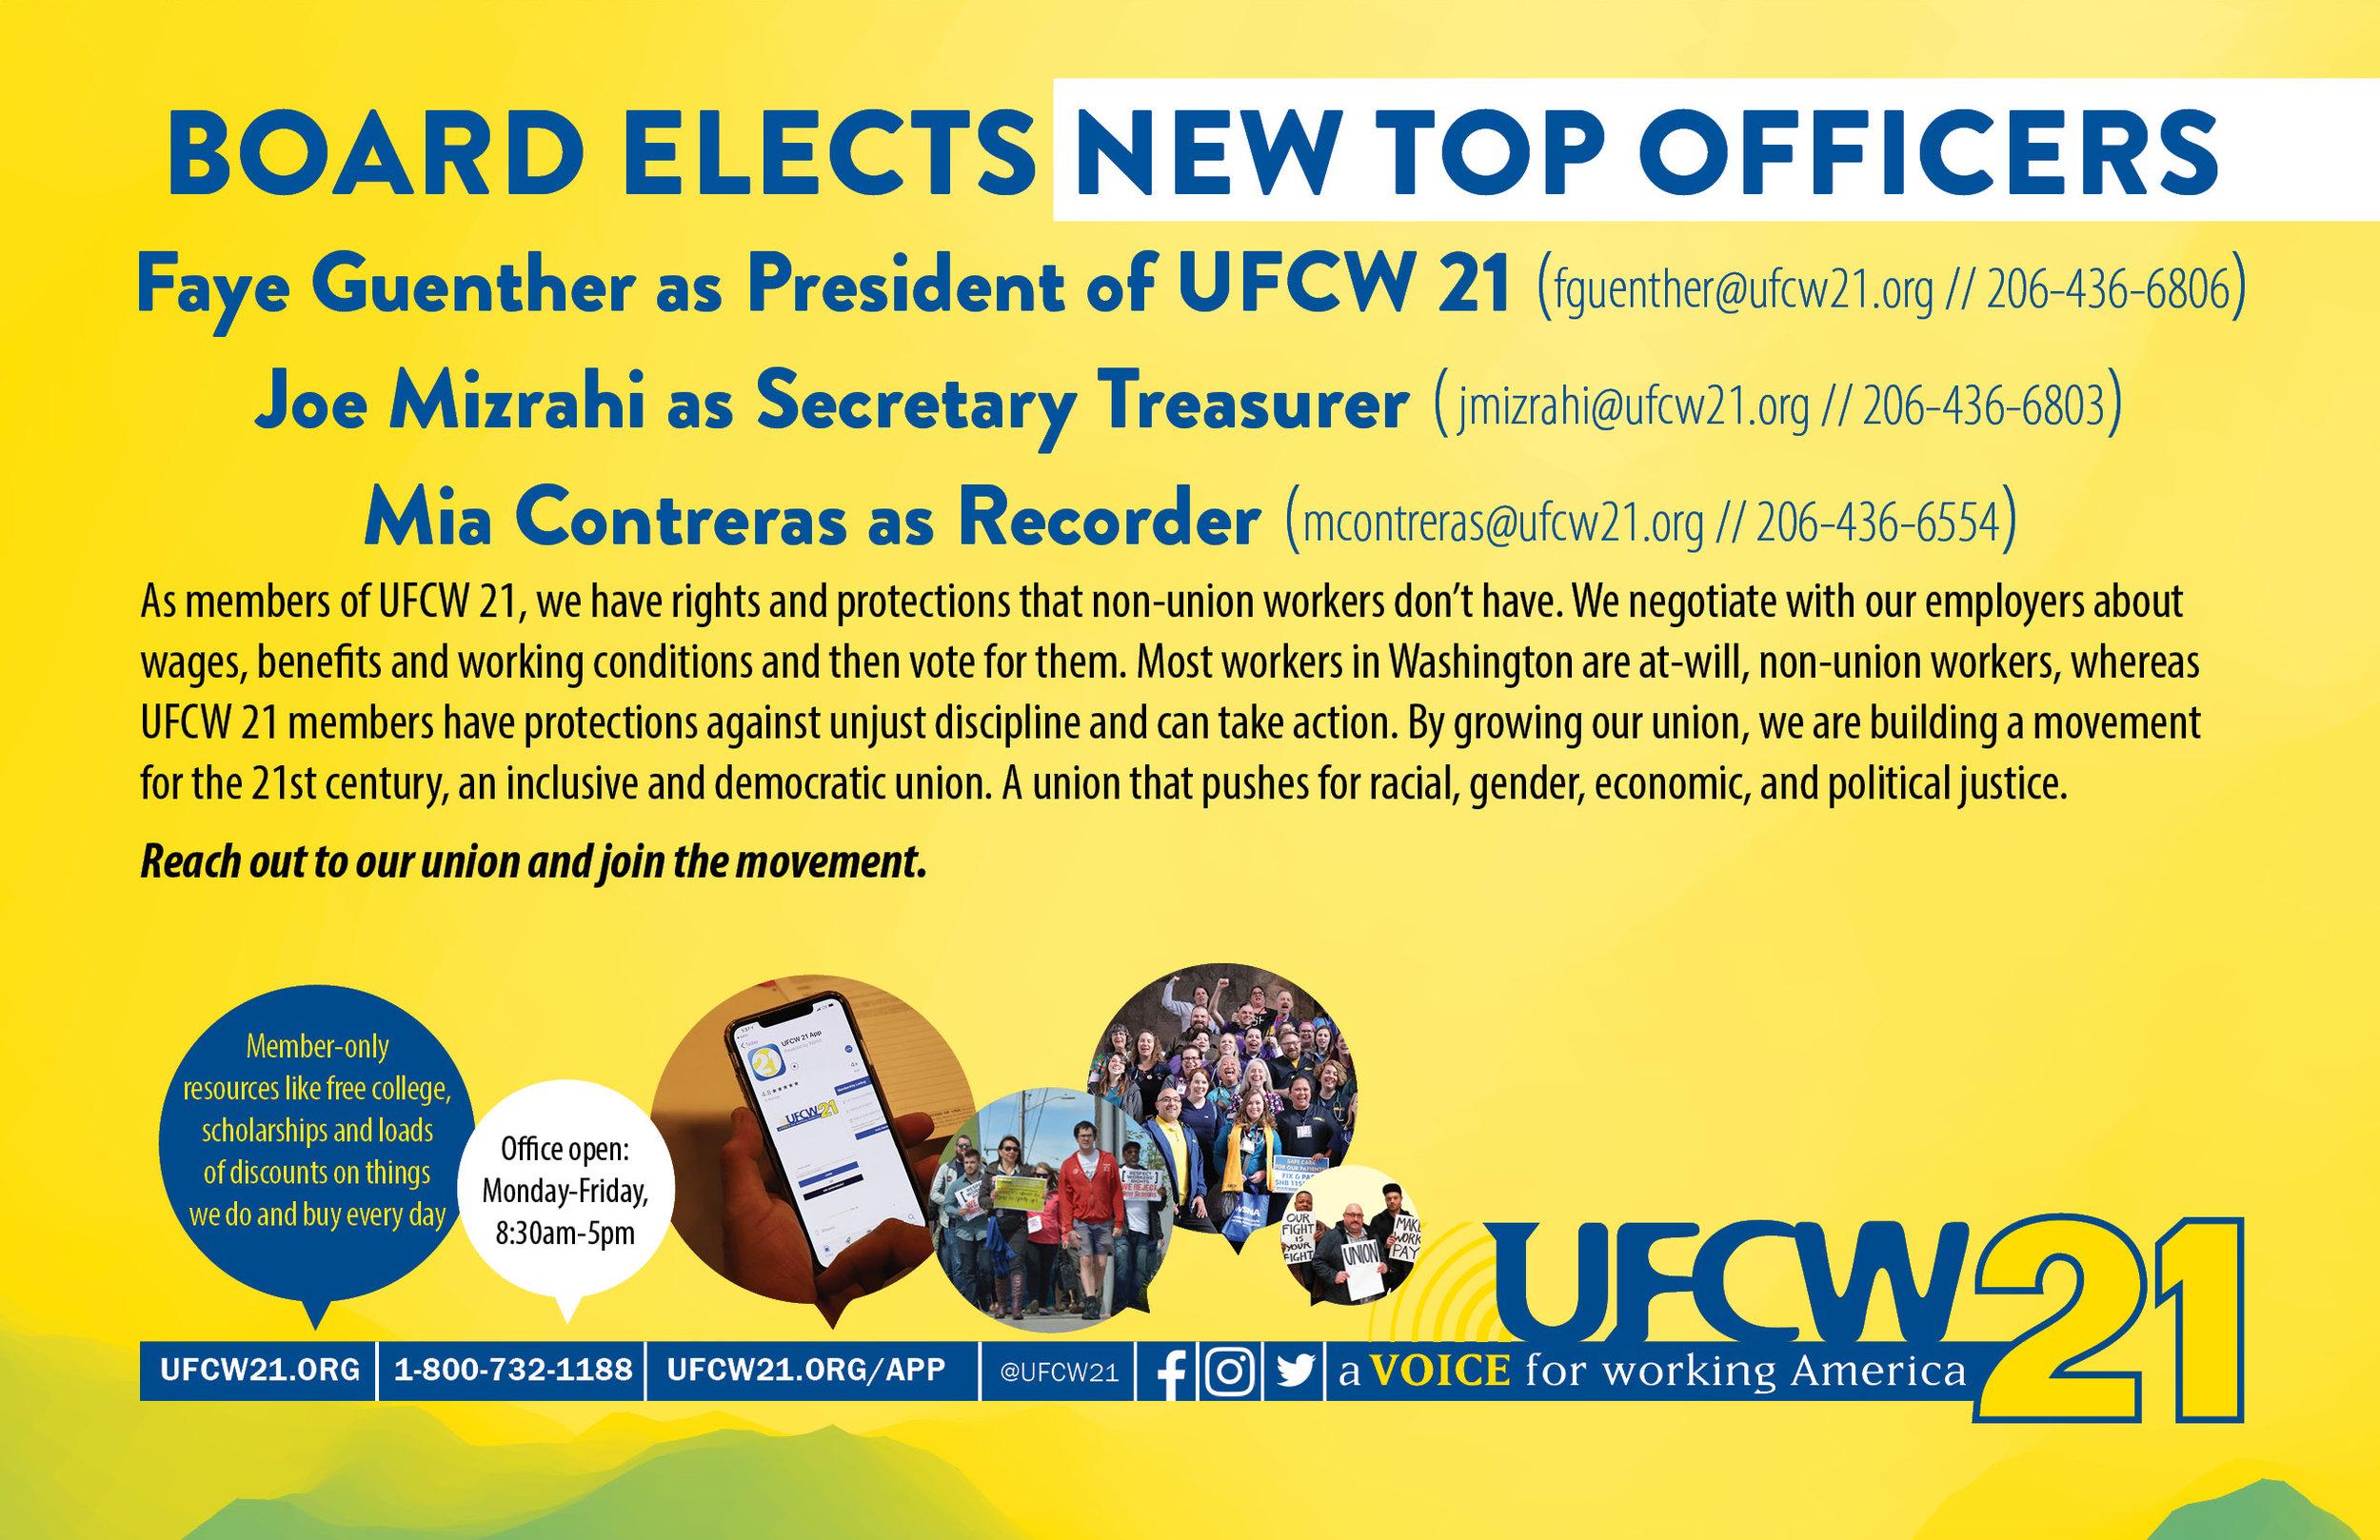 2019 0429 Faye Guenther President announcement mailer4.jpg